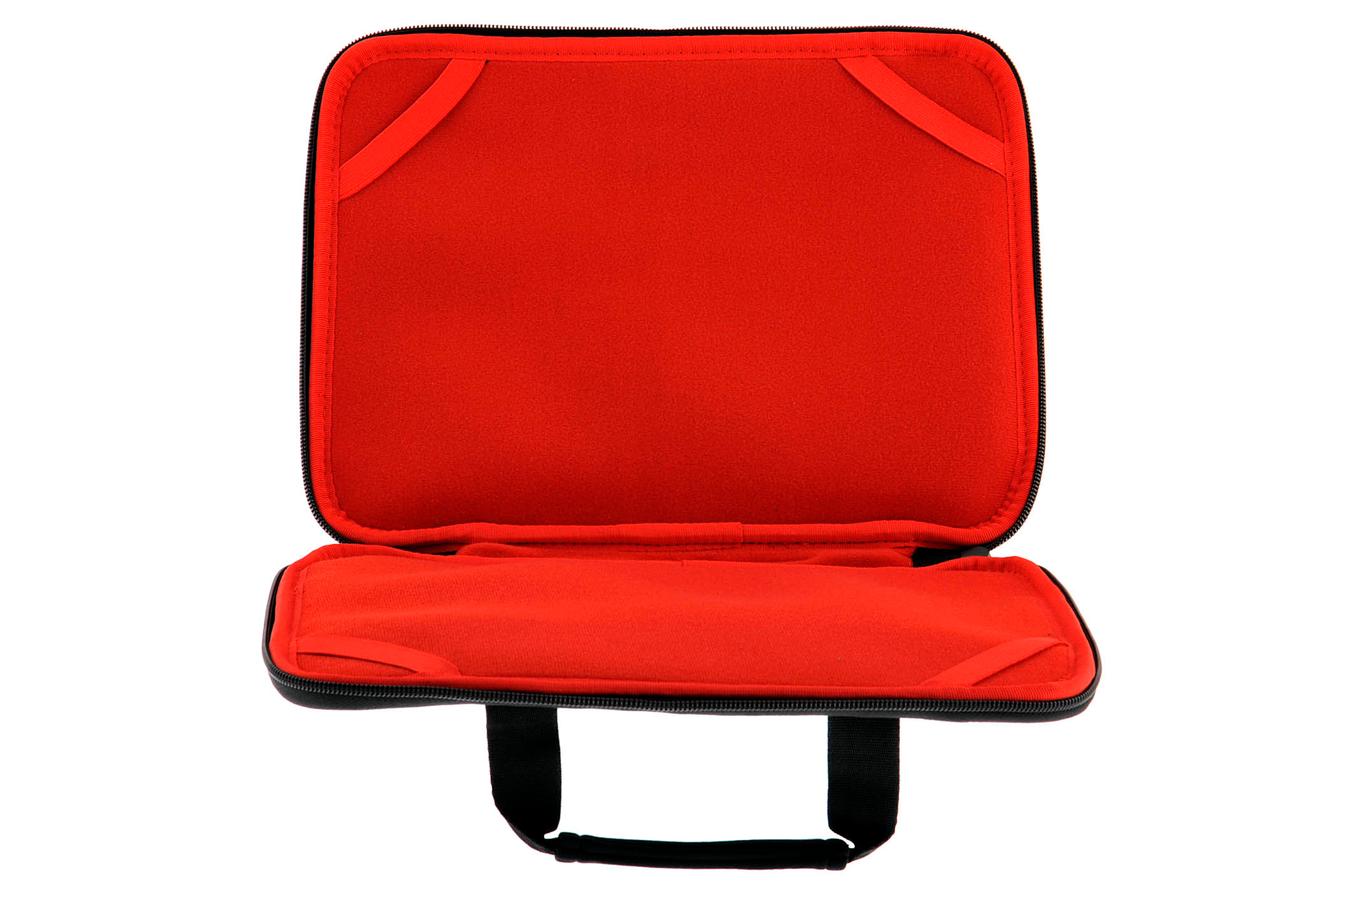 sacoche pour ordinateur portable port sacoche berlin 11 6. Black Bedroom Furniture Sets. Home Design Ideas